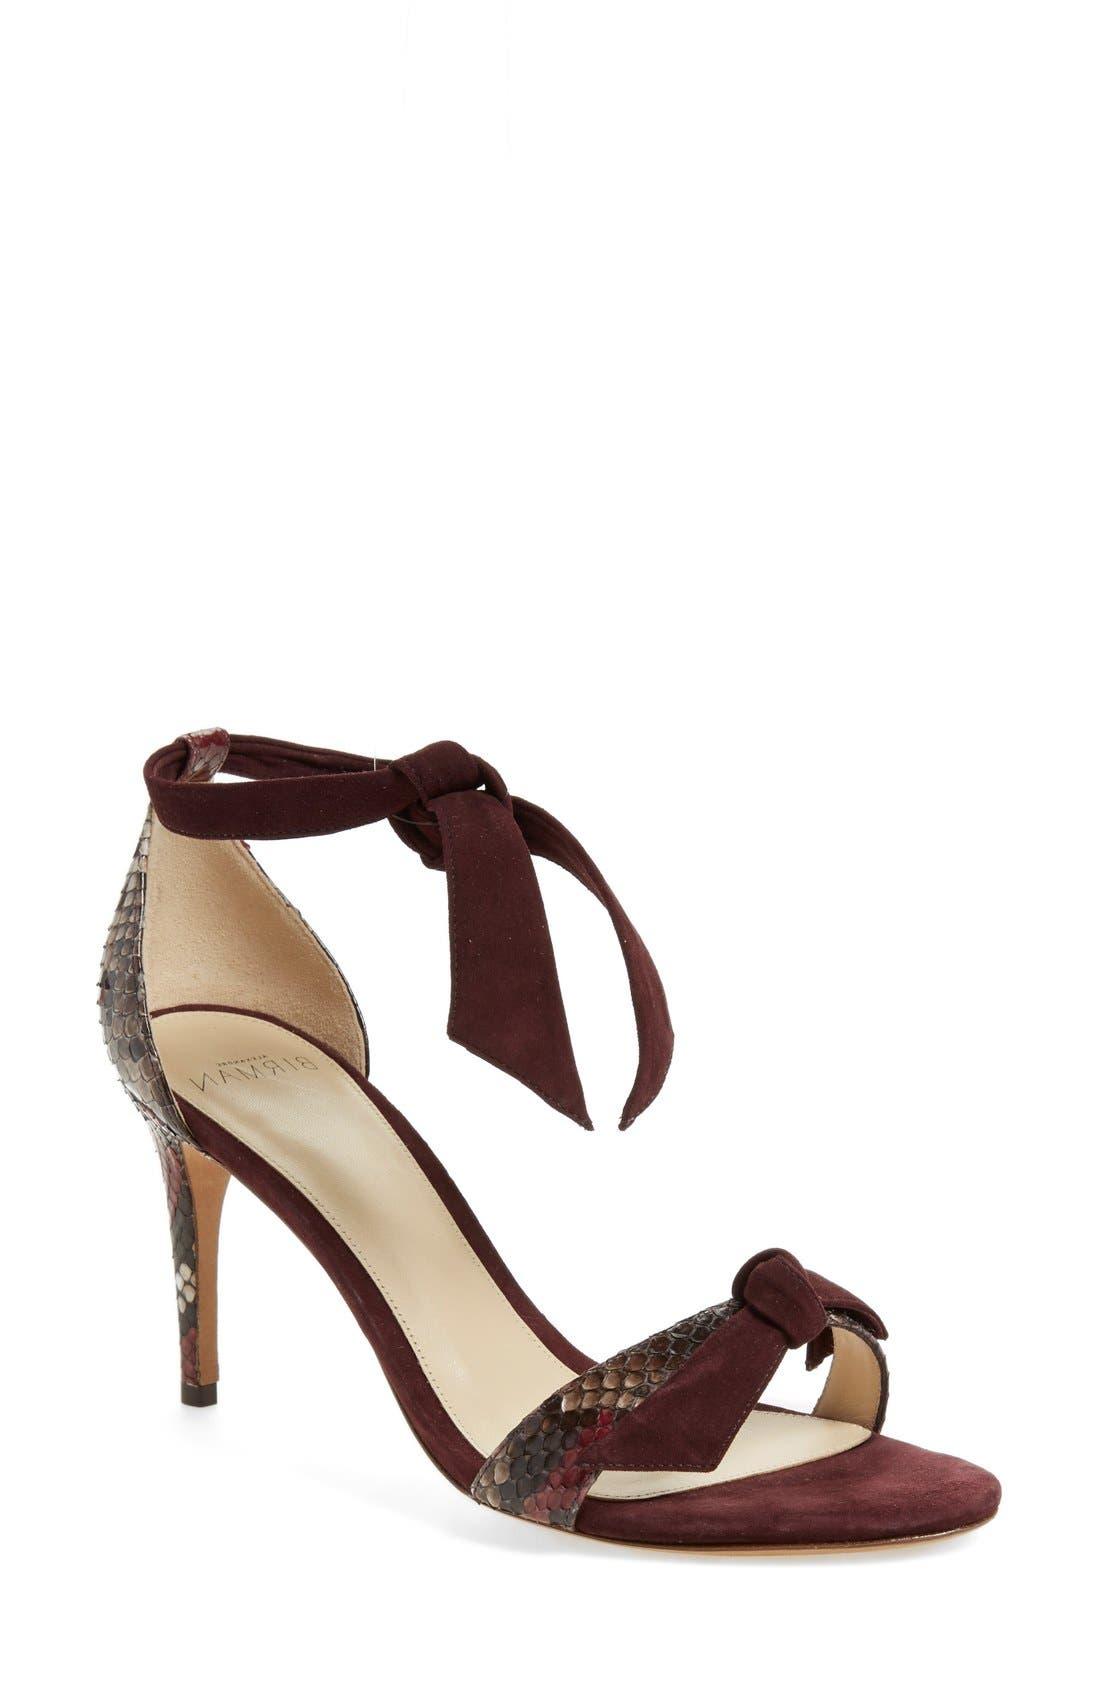 Main Image - Alexandre Birman 'Clarita' Suede & Genuine Python Ankle Tie Sandal (Women) (Nordstrom Exclusive)